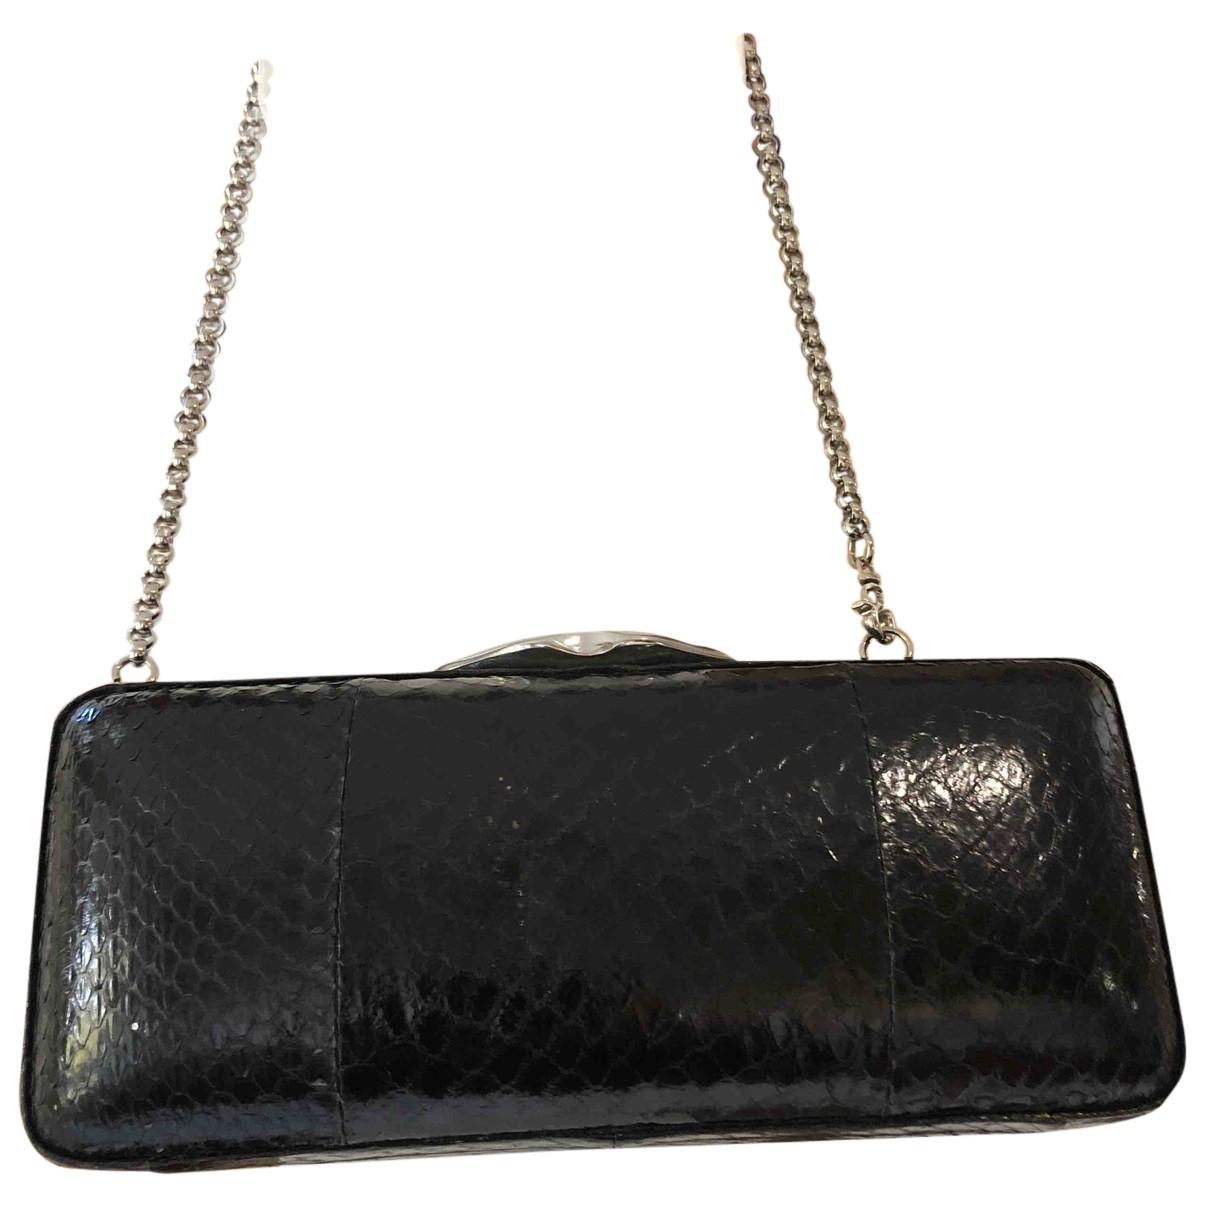 Bolsos clutch en Serpiente de agua Negro Lulu Guinness